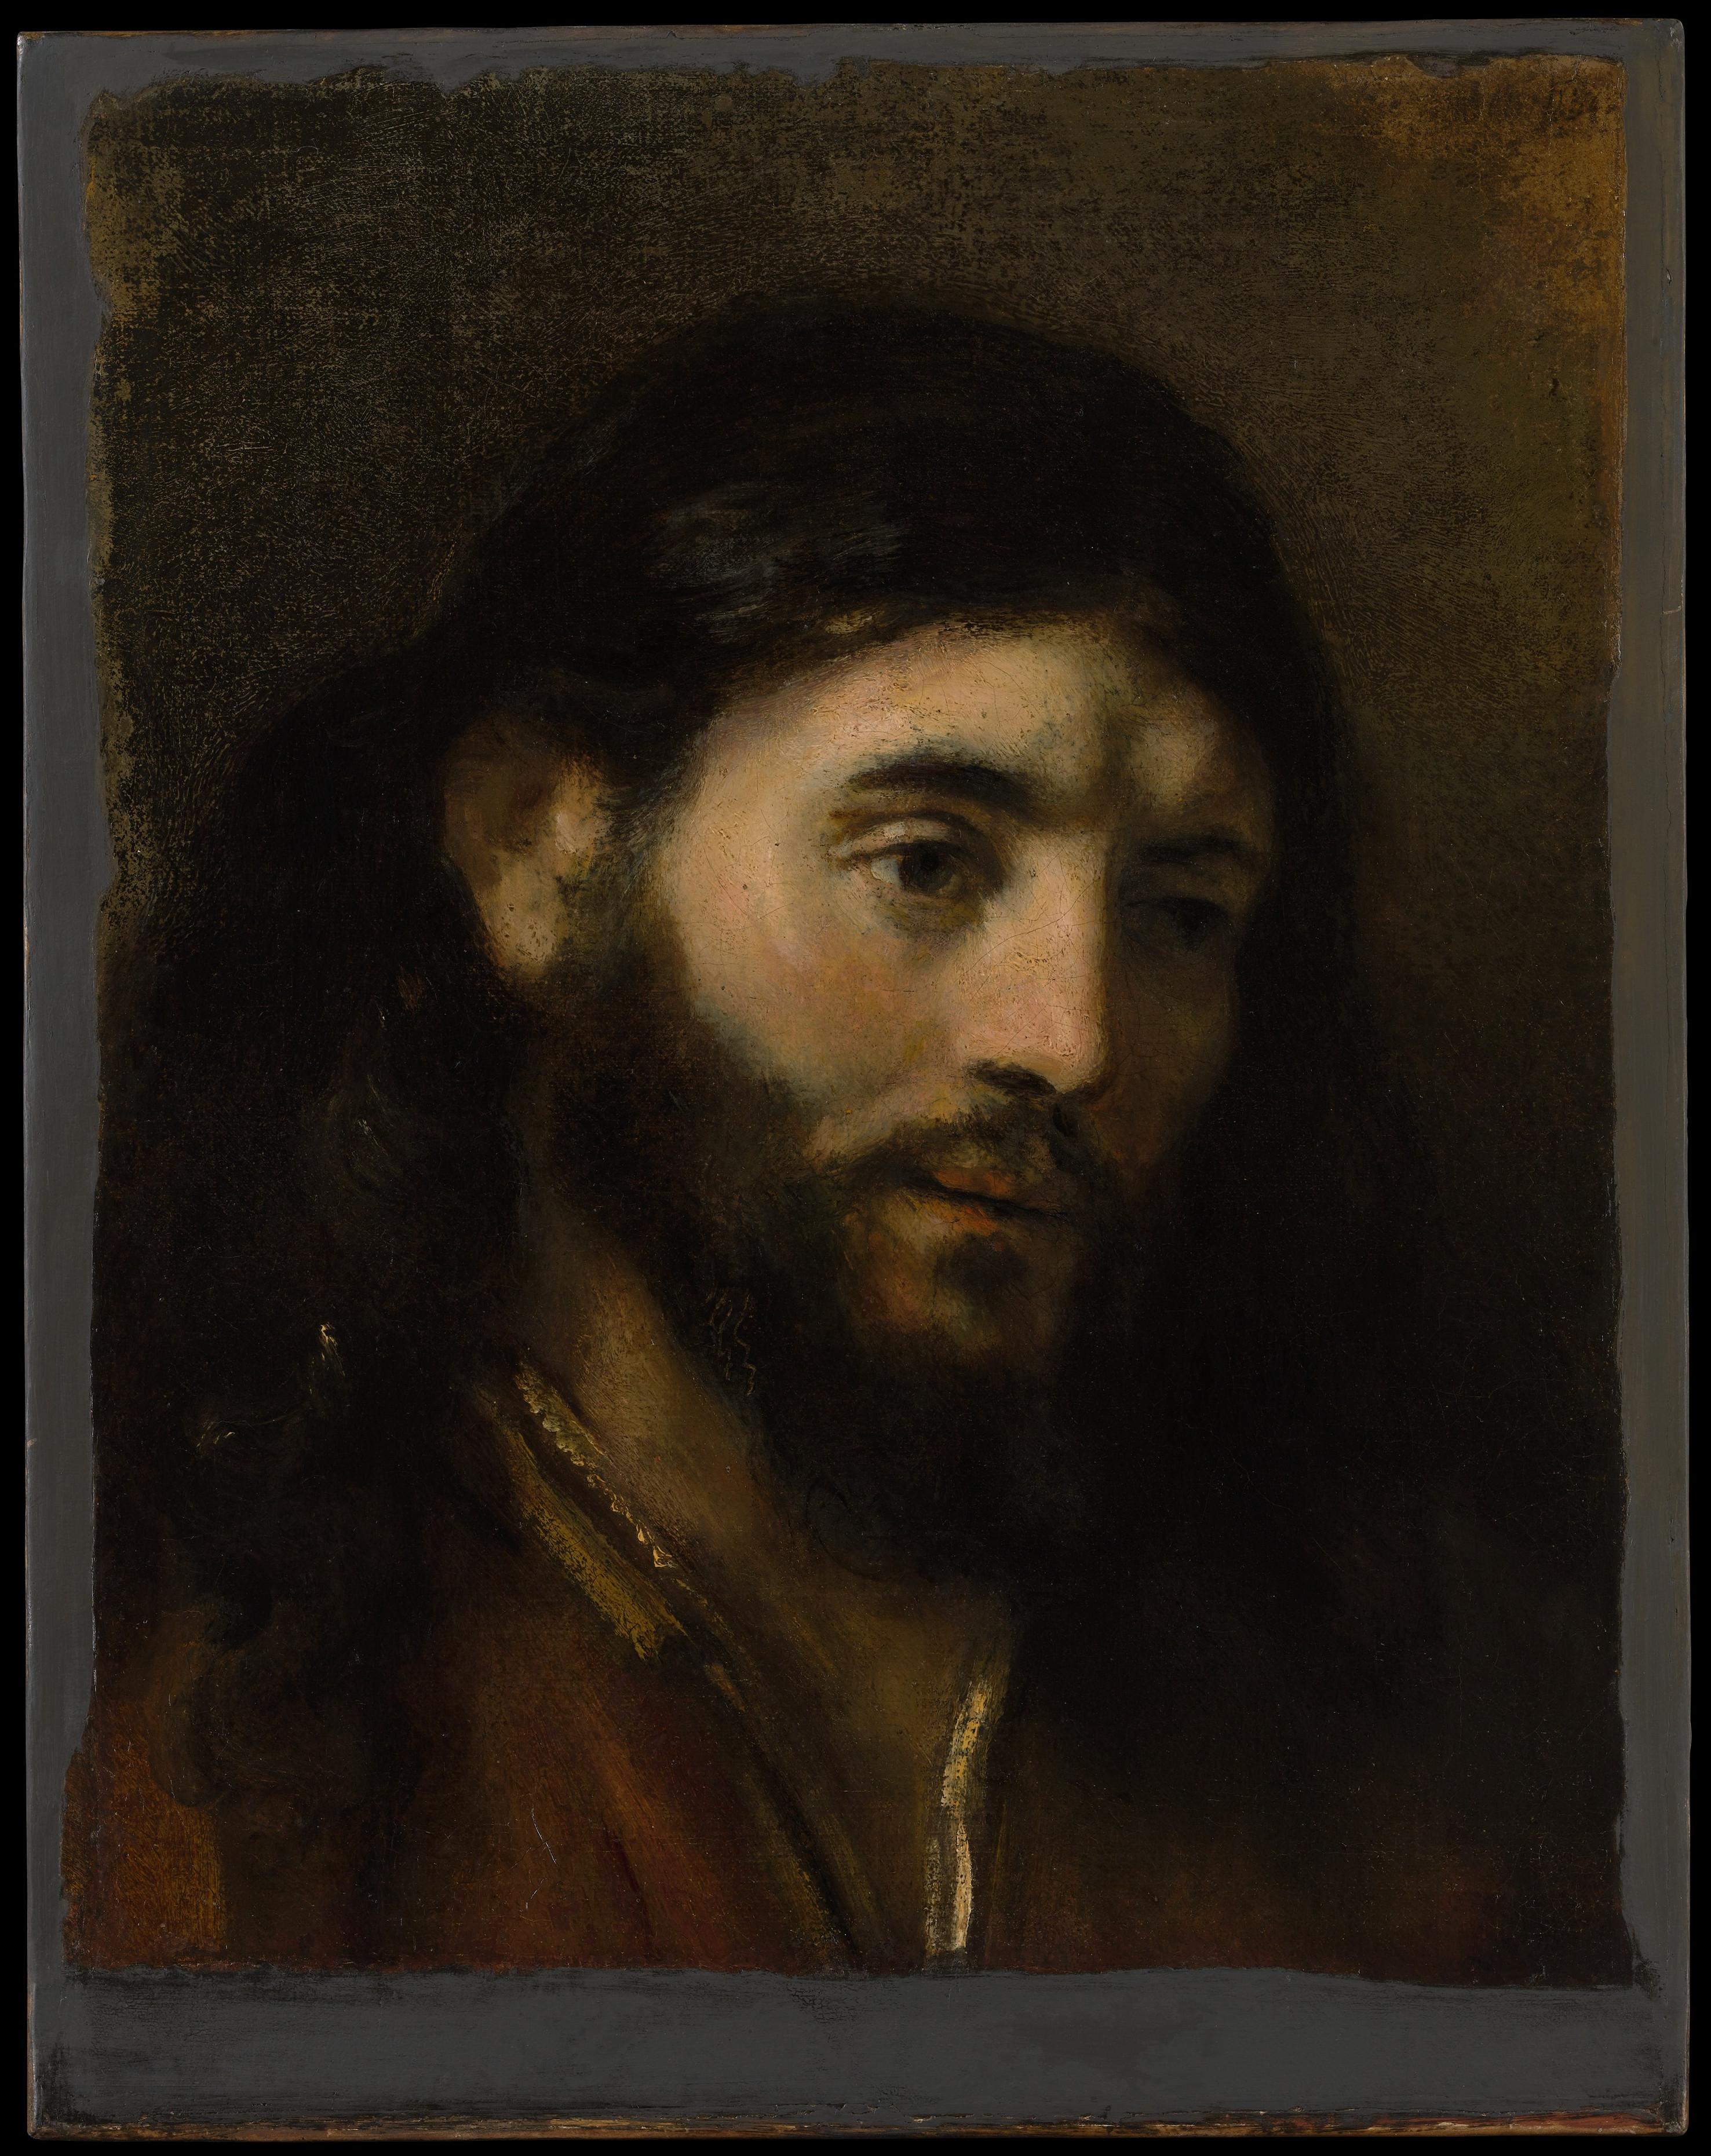 https://upload.wikimedia.org/wikipedia/commons/6/6b/Head_of_Christ_MET_DP145916.jpg